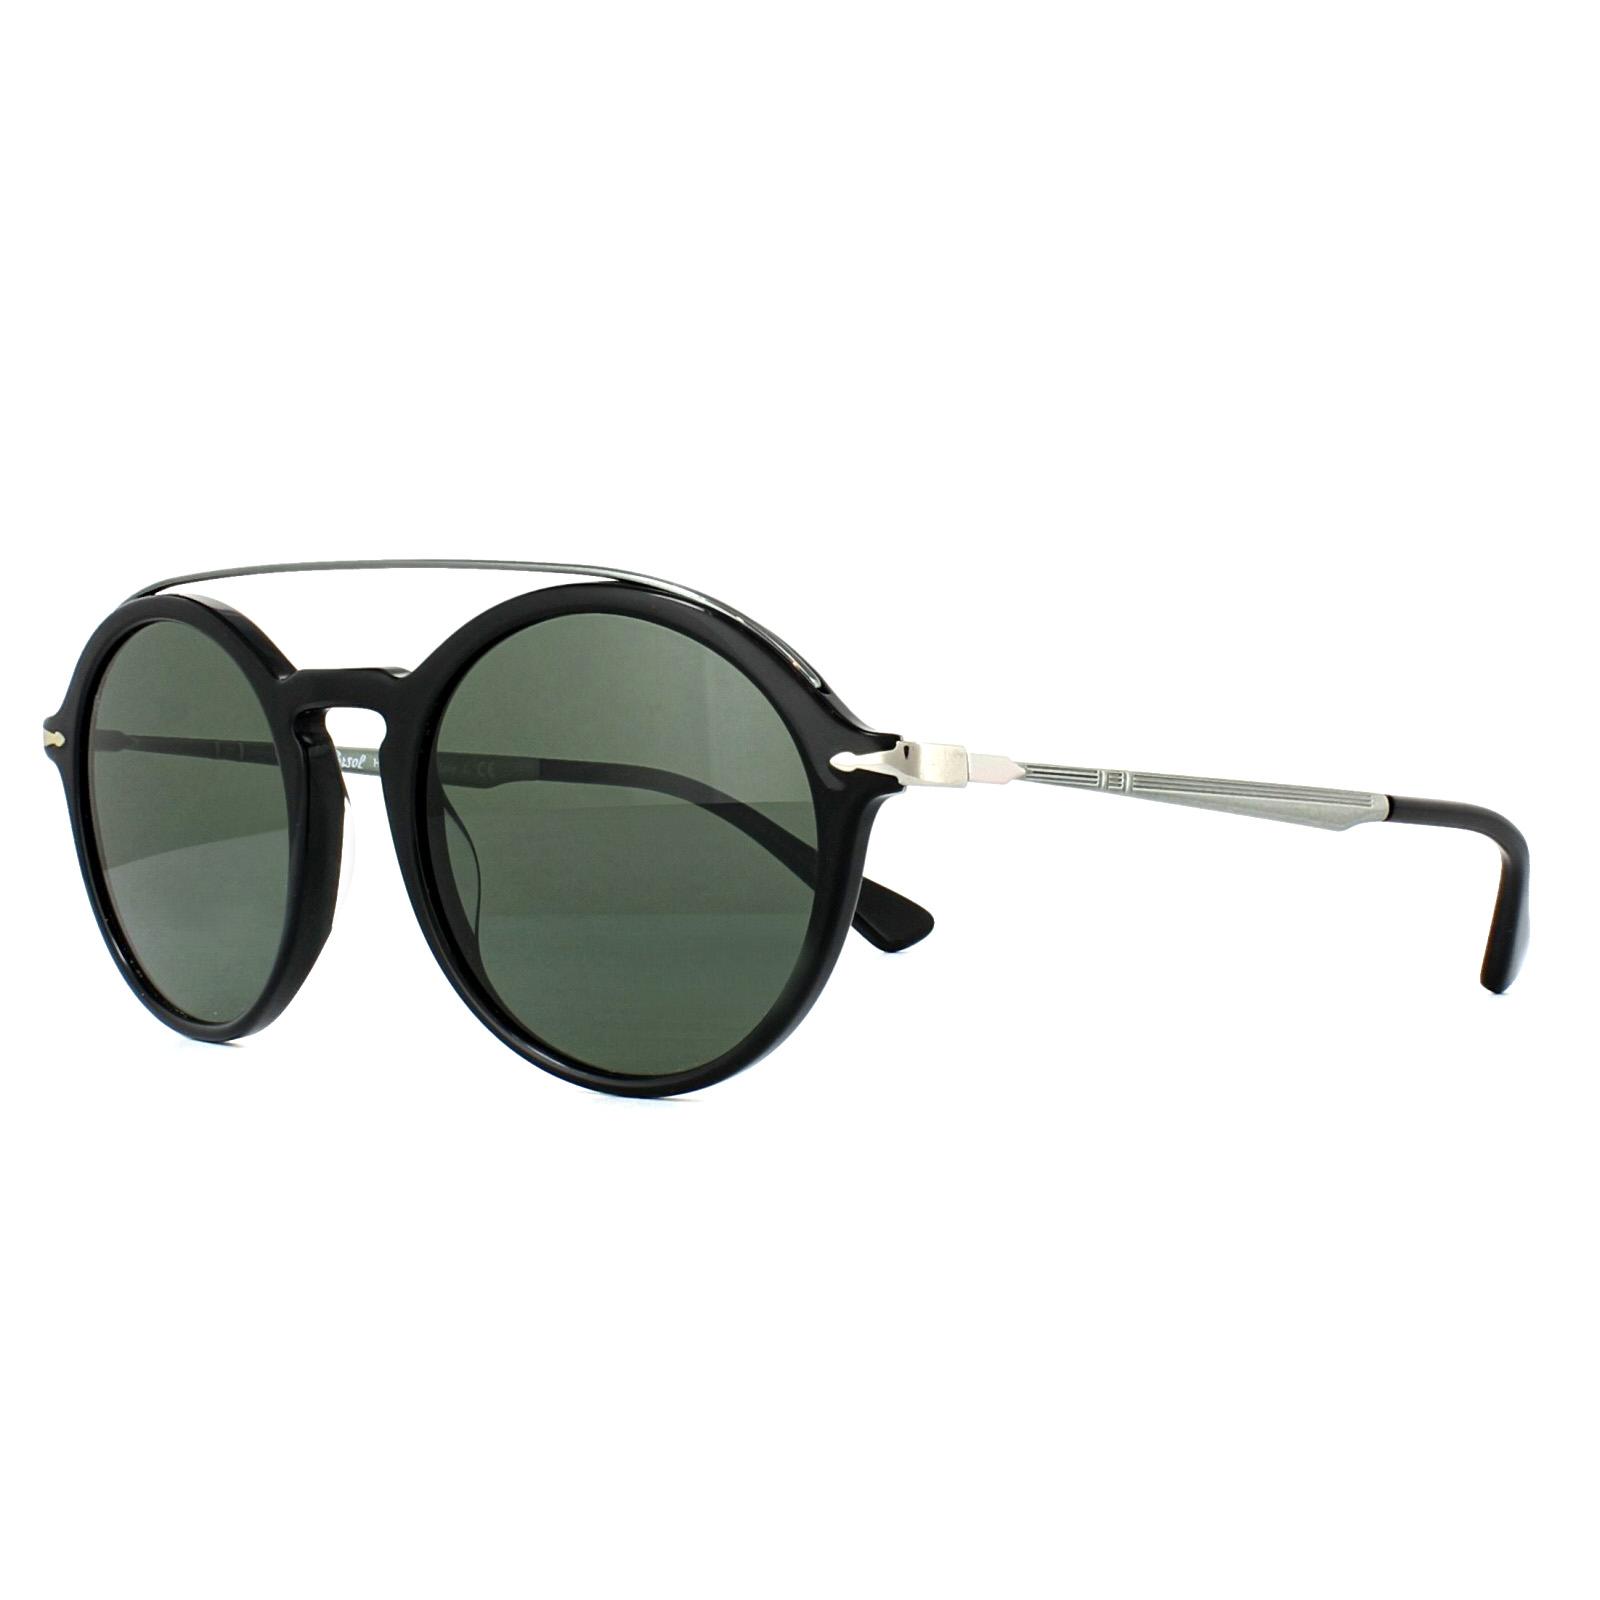 a1b090720b Persol Sunglasses 3172S 95 31 Black Green 8053672764192